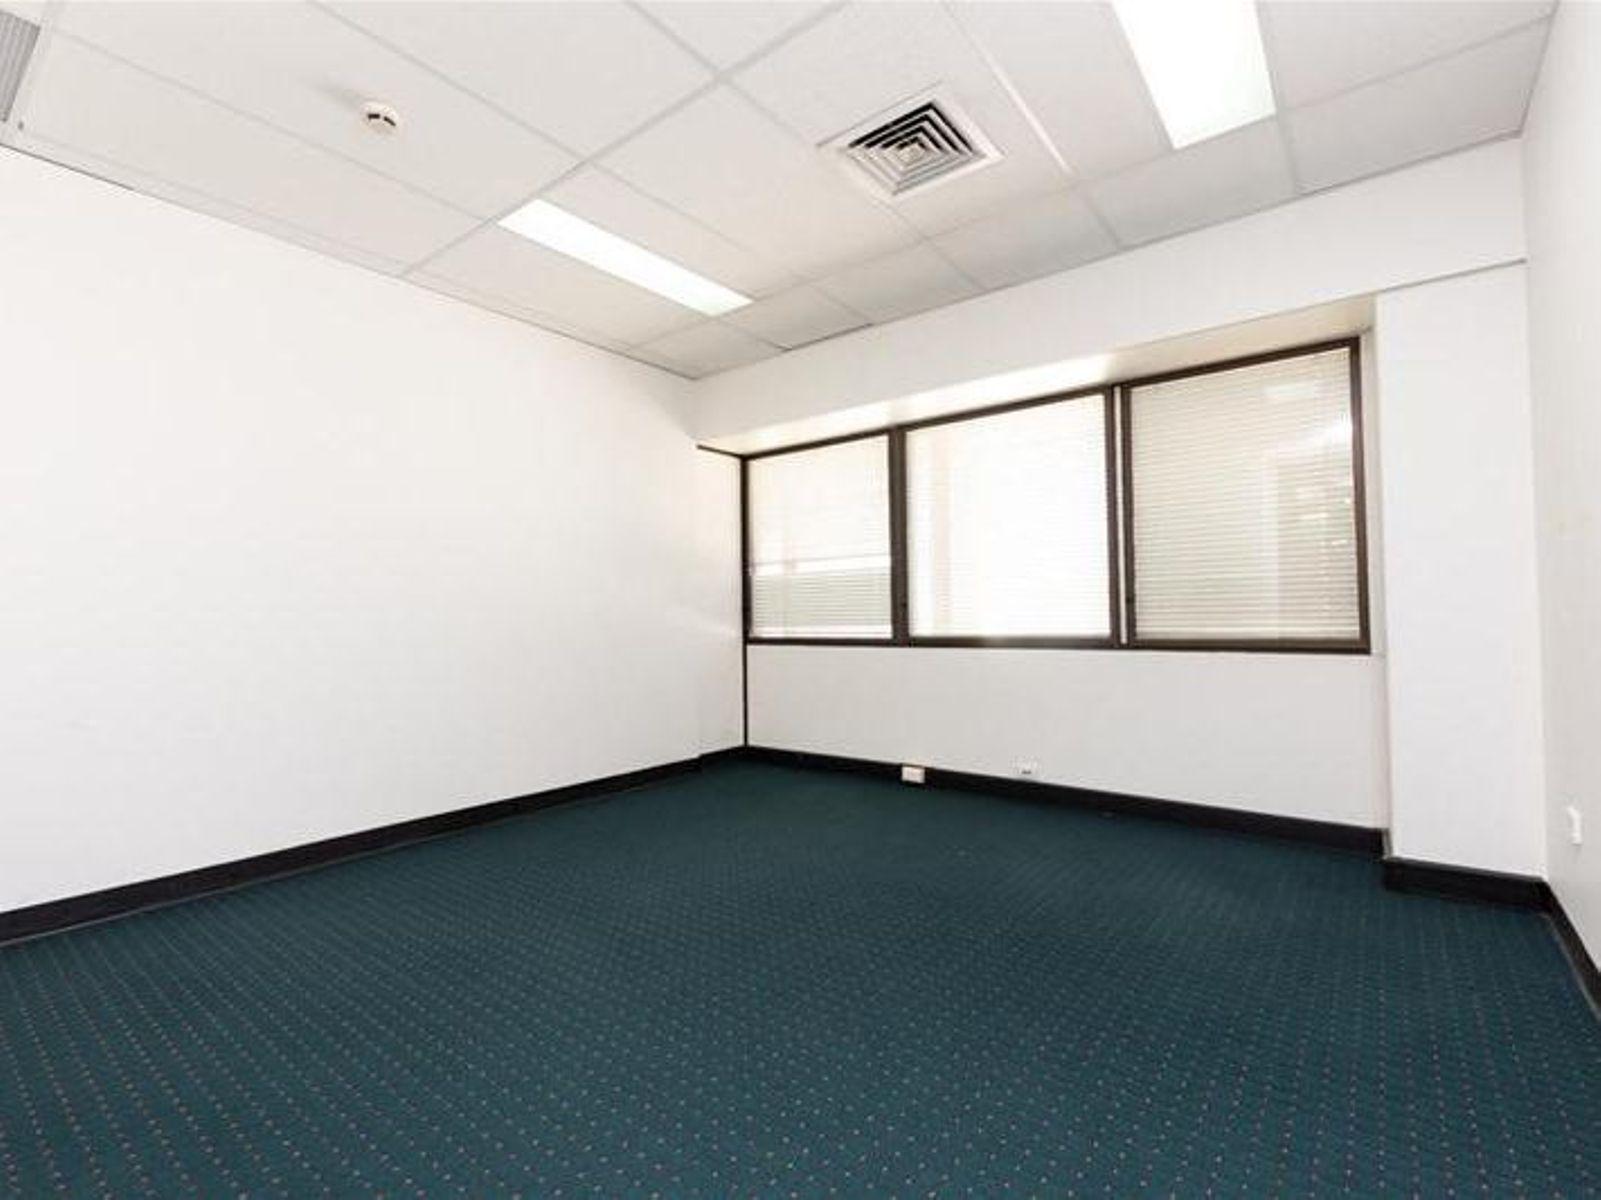 Level 2/82 Smith Street, Darwin City, NT 0800